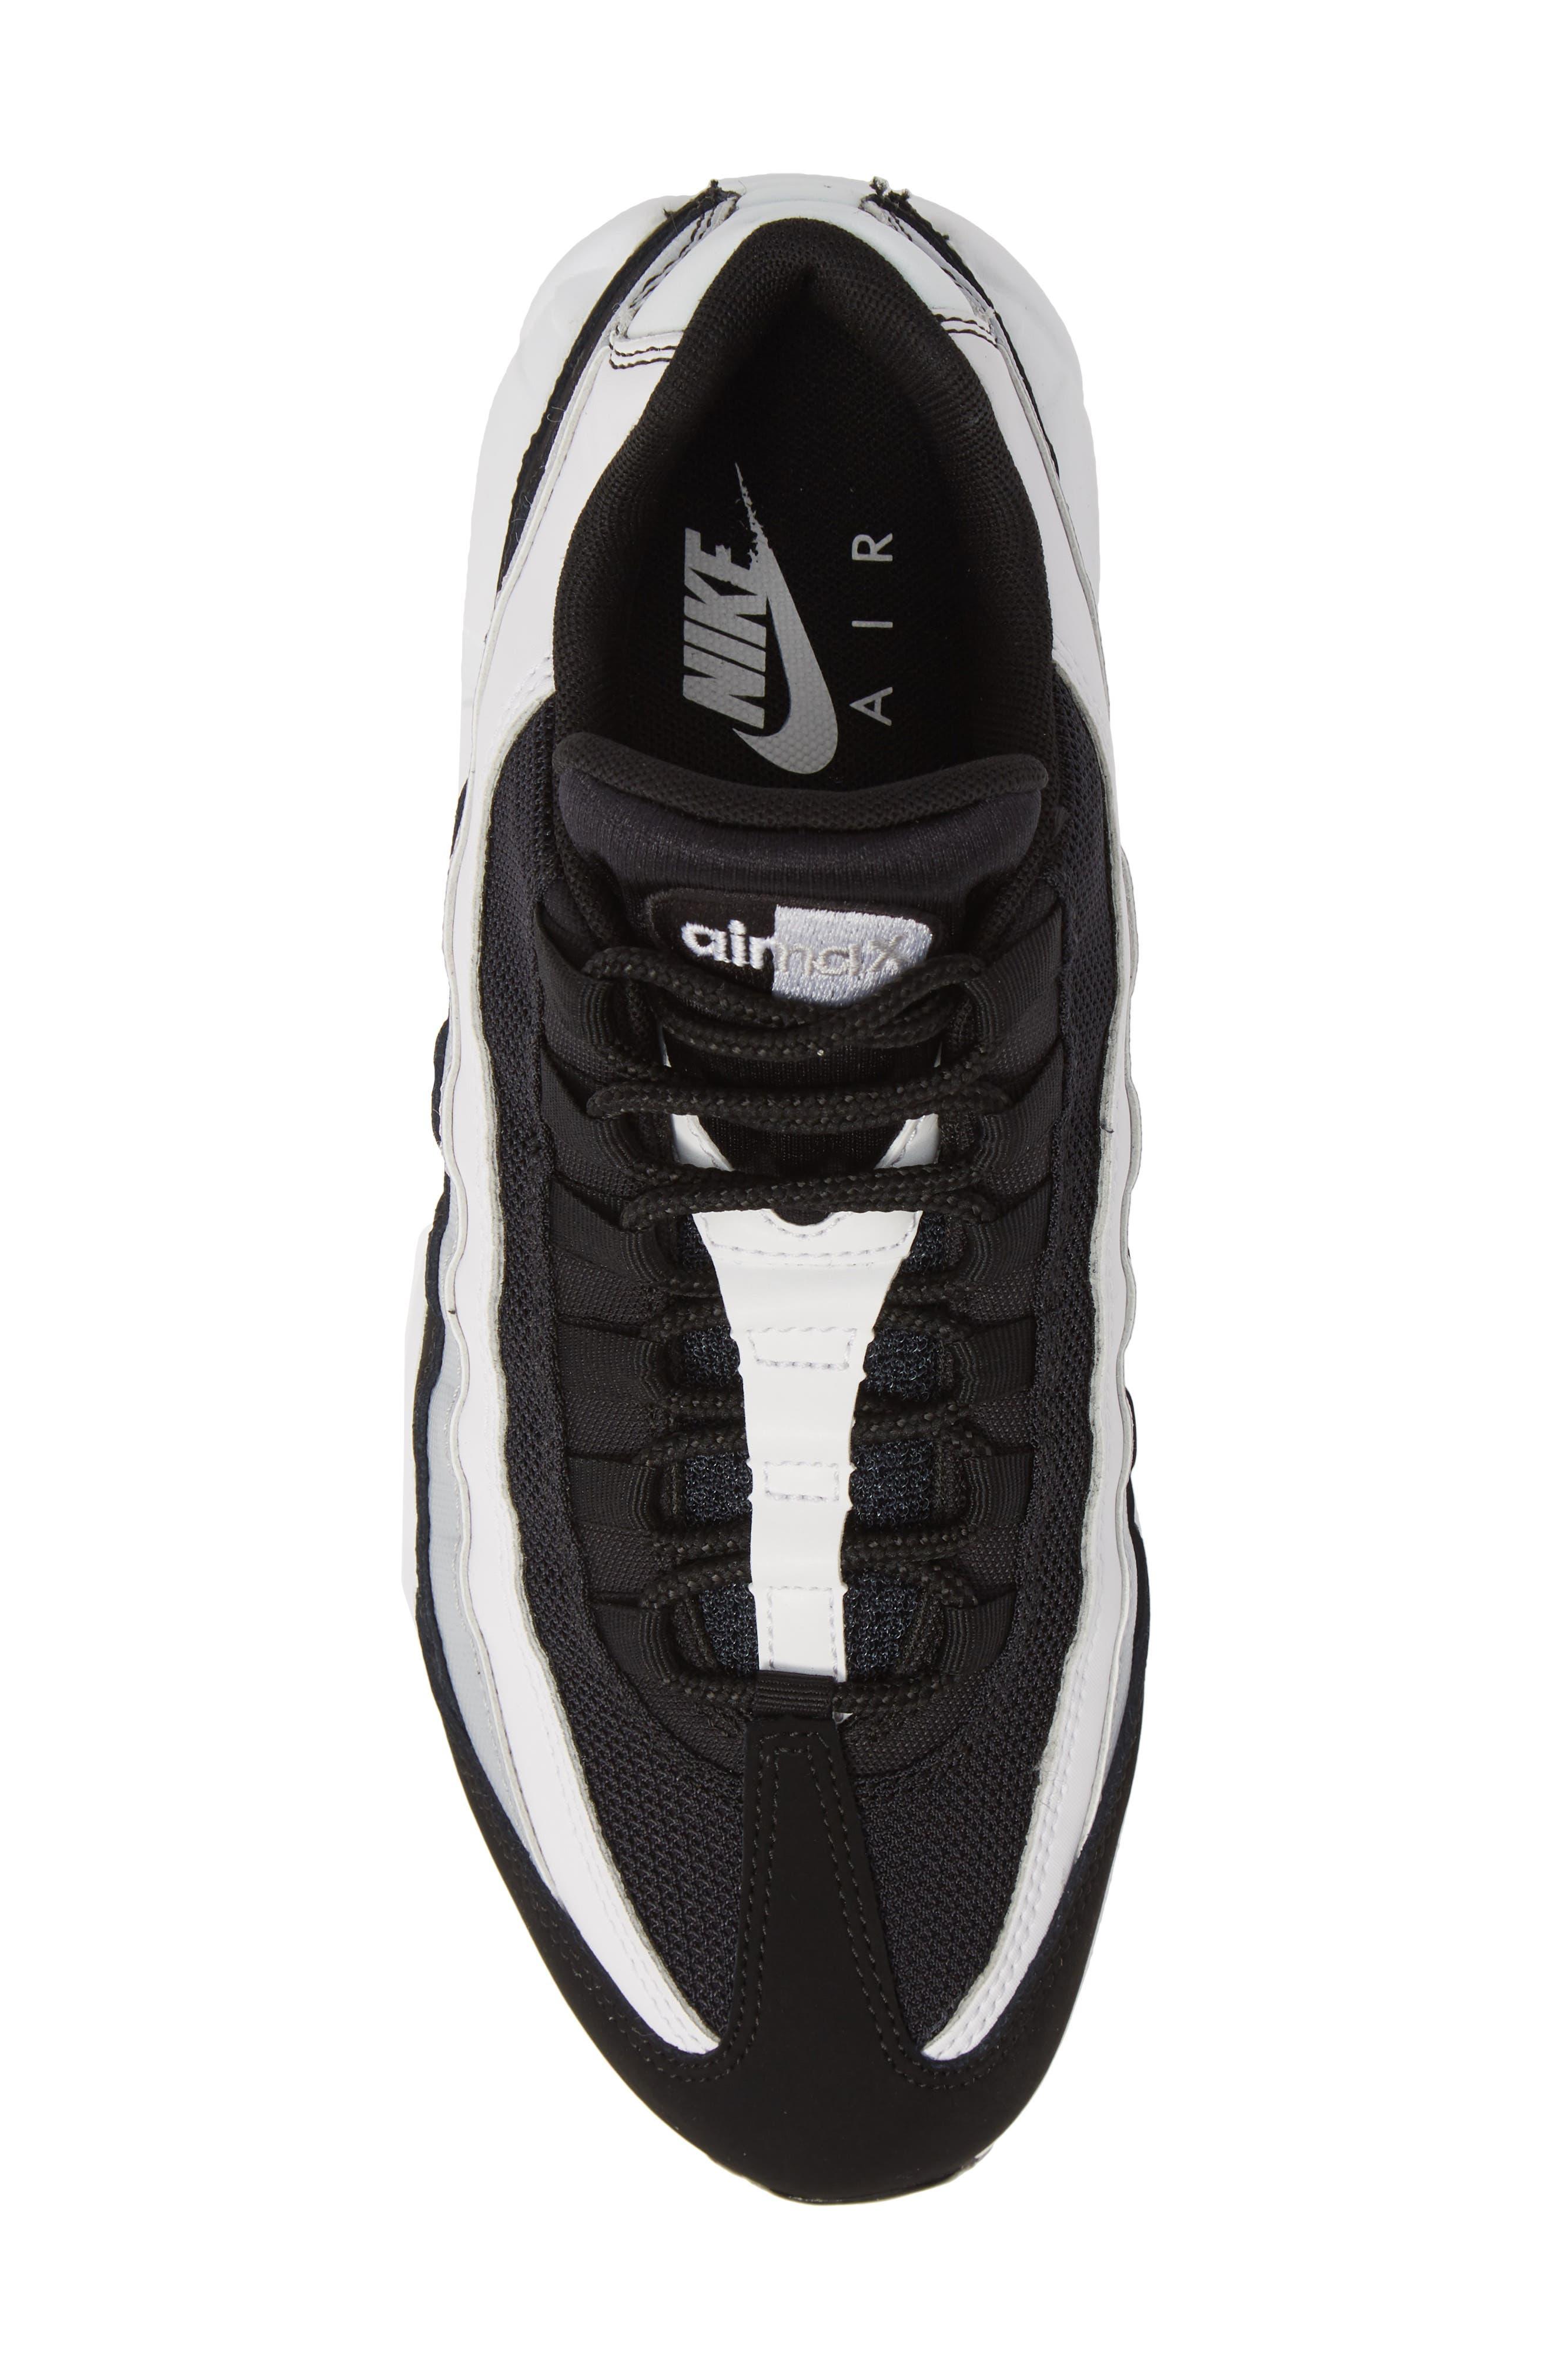 NIKE,                             'Air Max 95 Essential' Sneaker,                             Alternate thumbnail 5, color,                             BLACK/ WHITE/ WOLF GREY